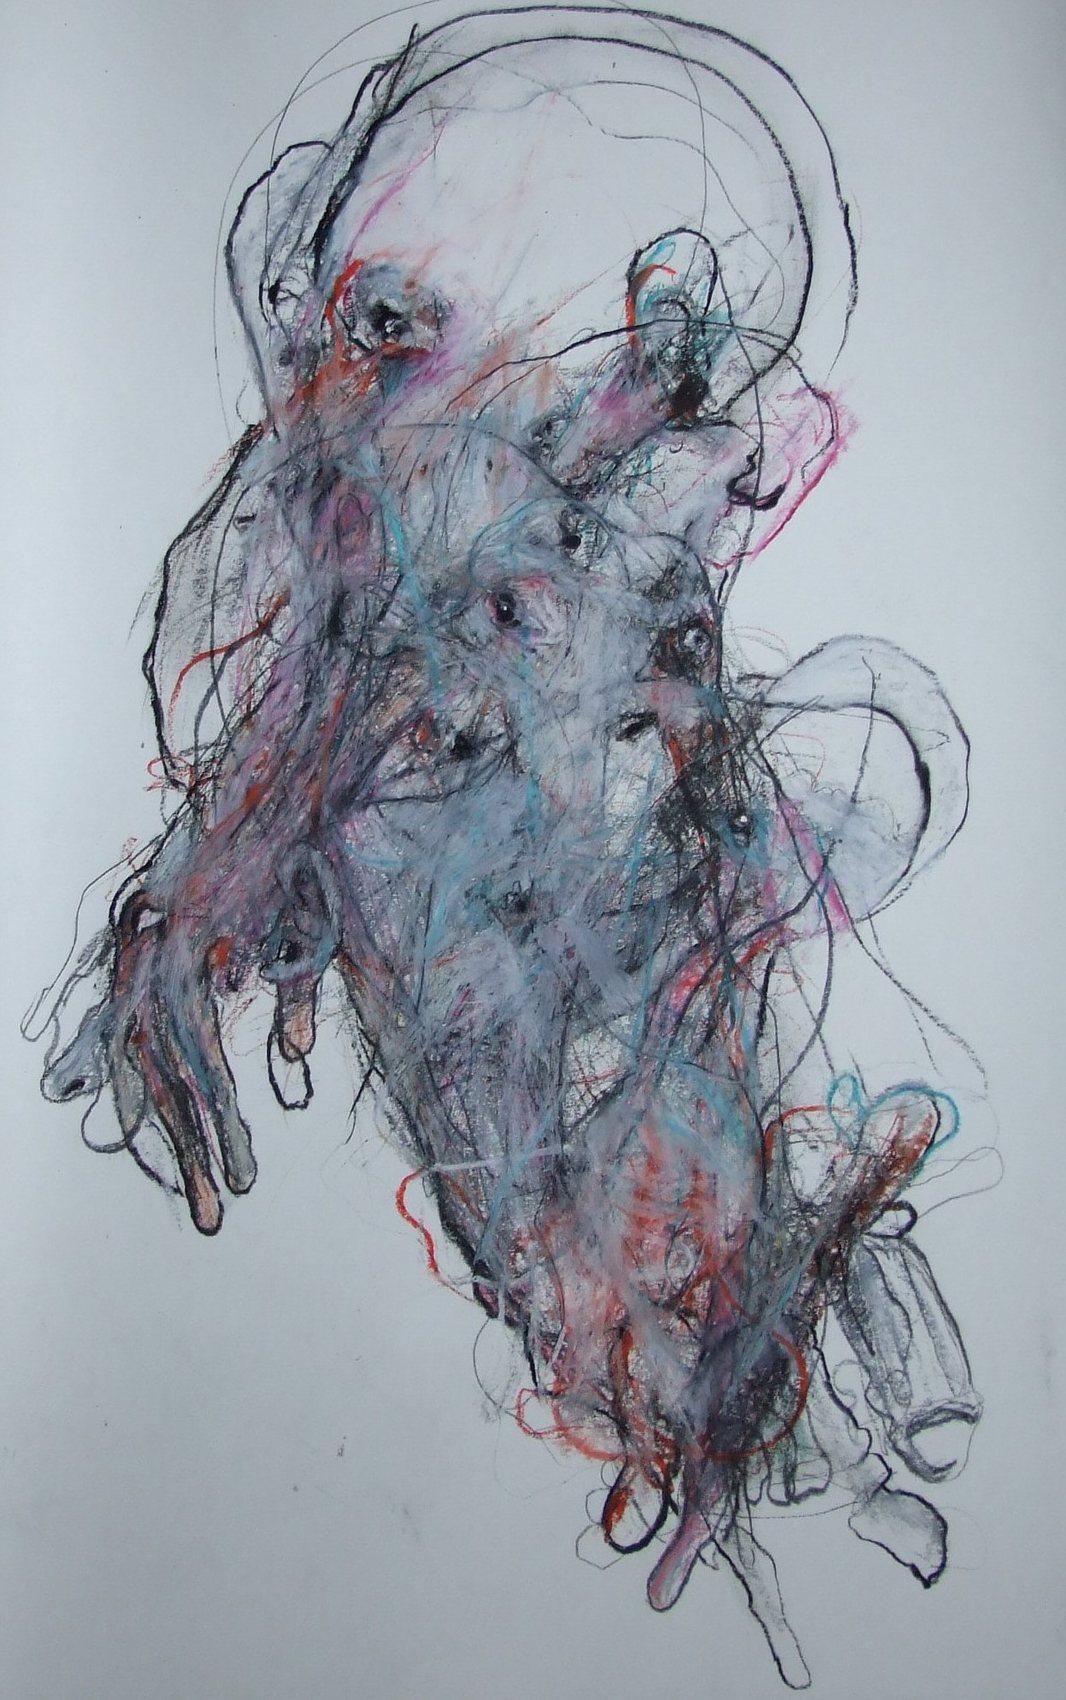 dessin technique mixte 2012 1,50x0,70